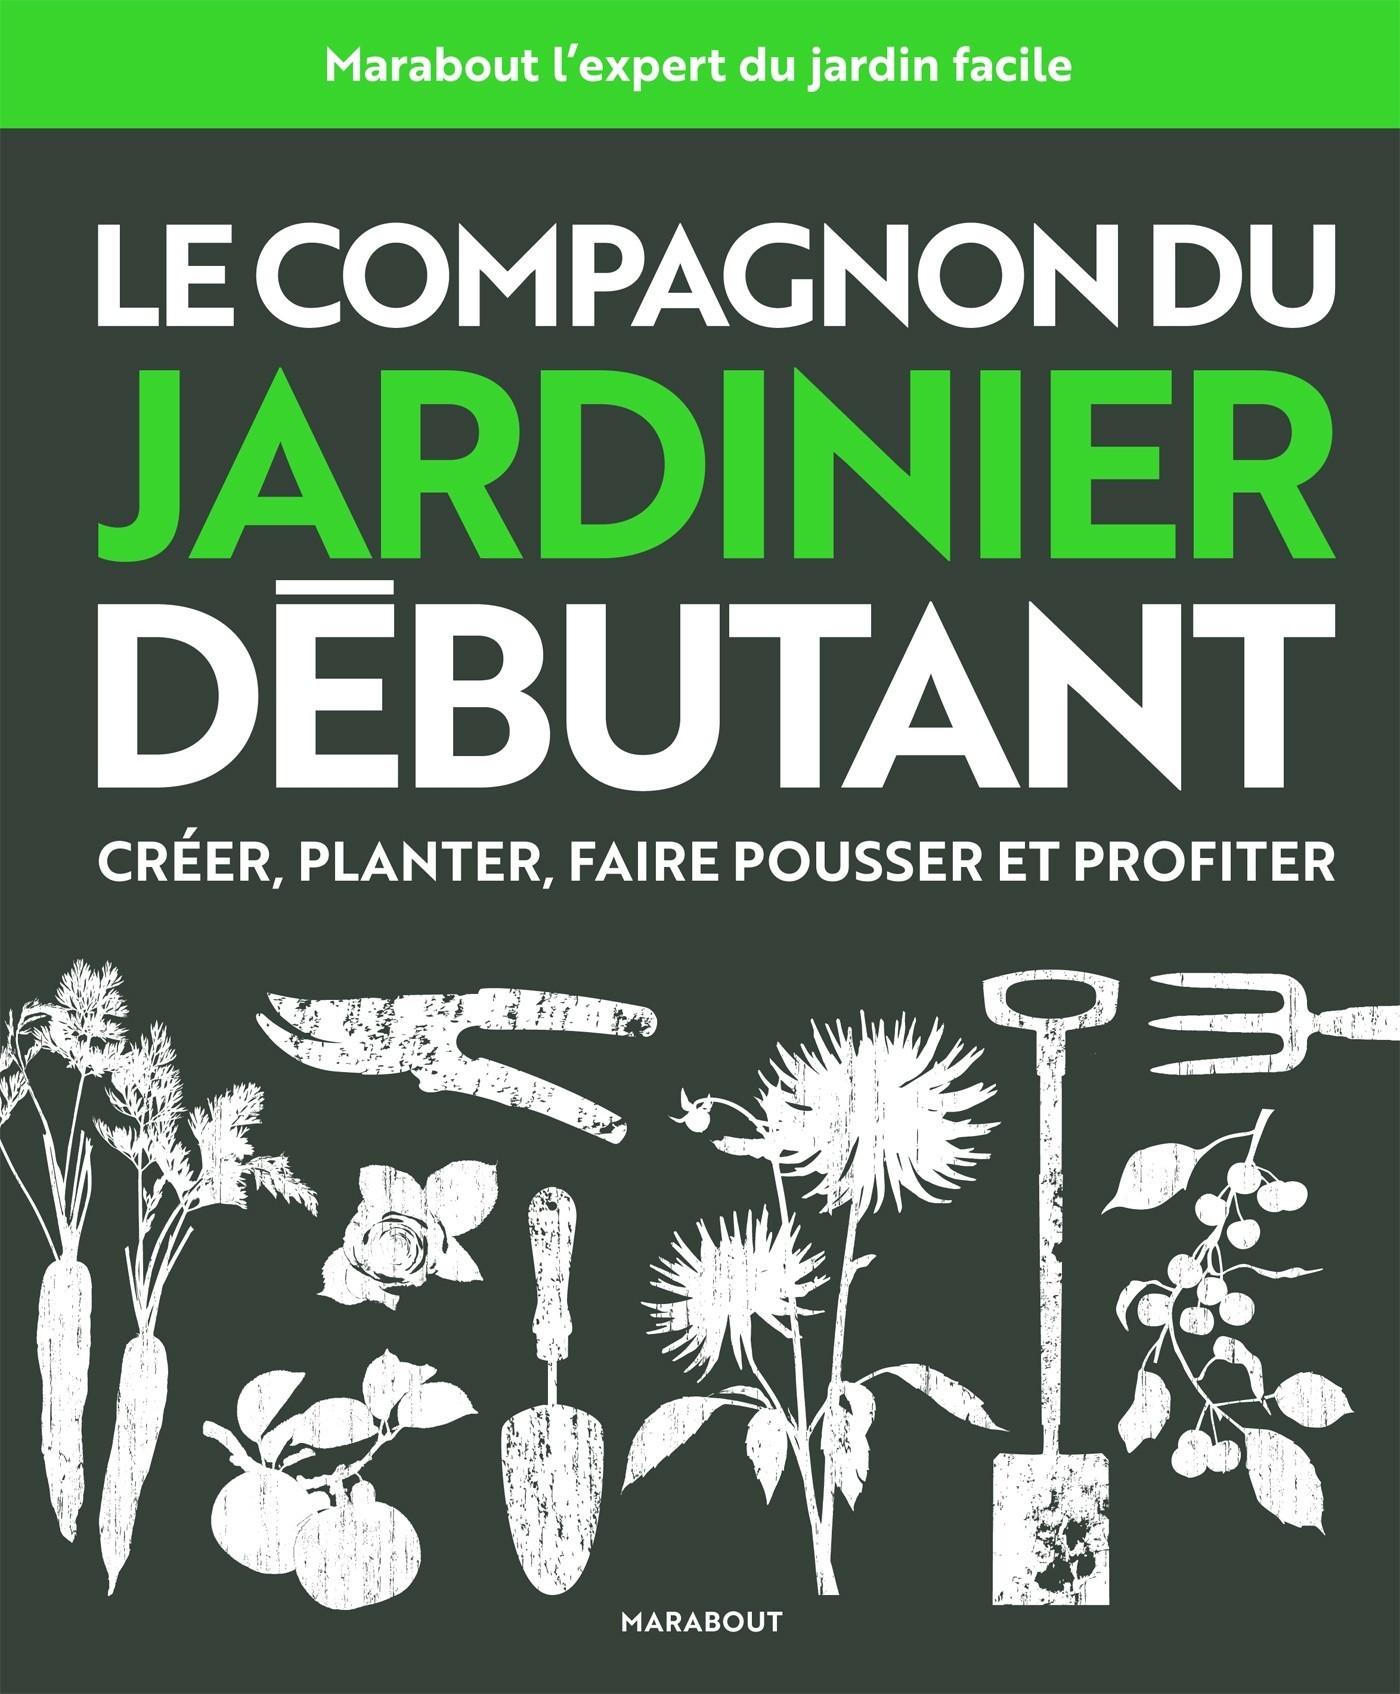 LE COMPAGNON DU JARDINIER DEBUTANT